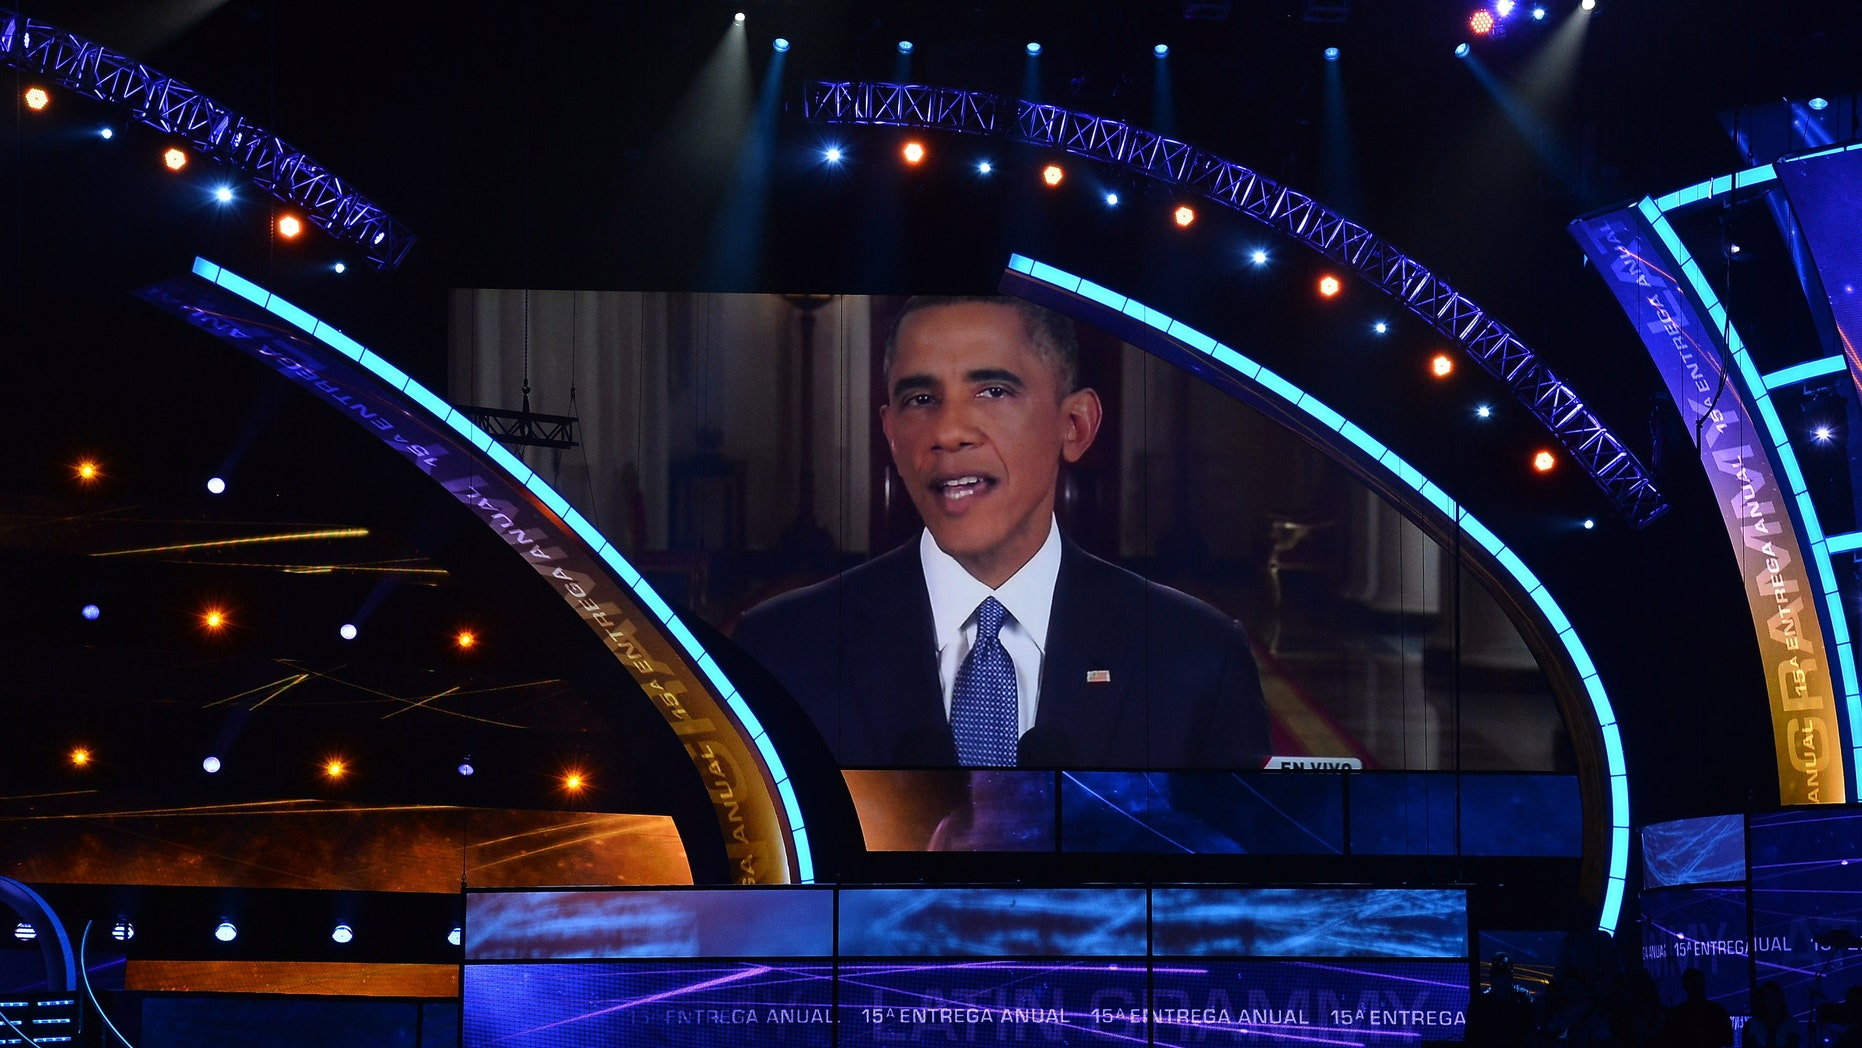 U.S. President Barack Obama before the start of the Latin GRAMMY Awards in Las Vegas, Nevada.